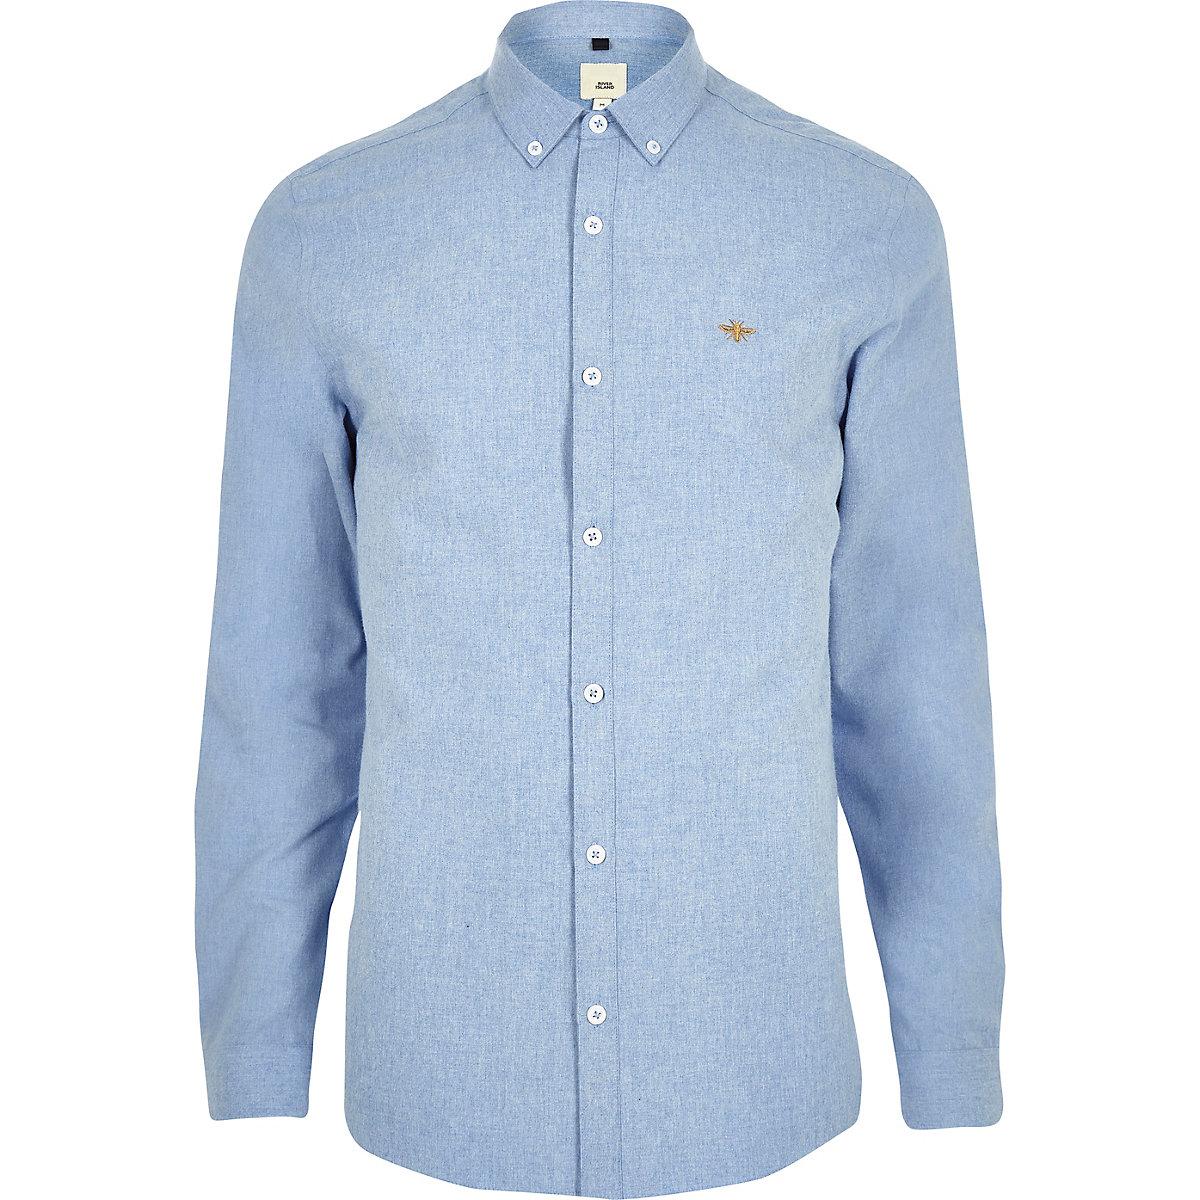 Light Blue Wasp Embroidered Long Sleeve Shirt Long Sleeve Shirts